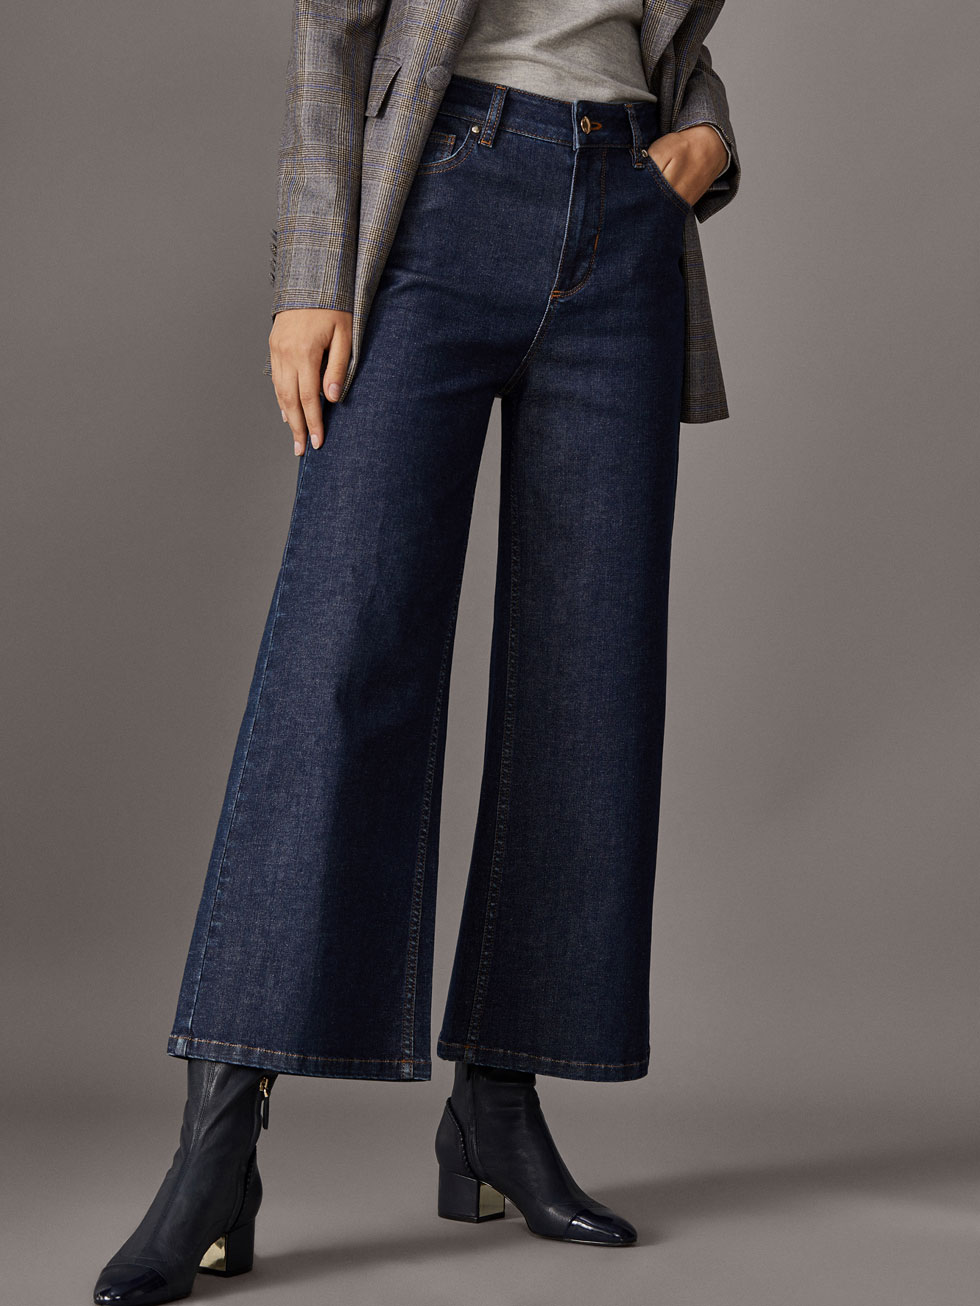 Jeans MASSIMO DUTTI £54.95